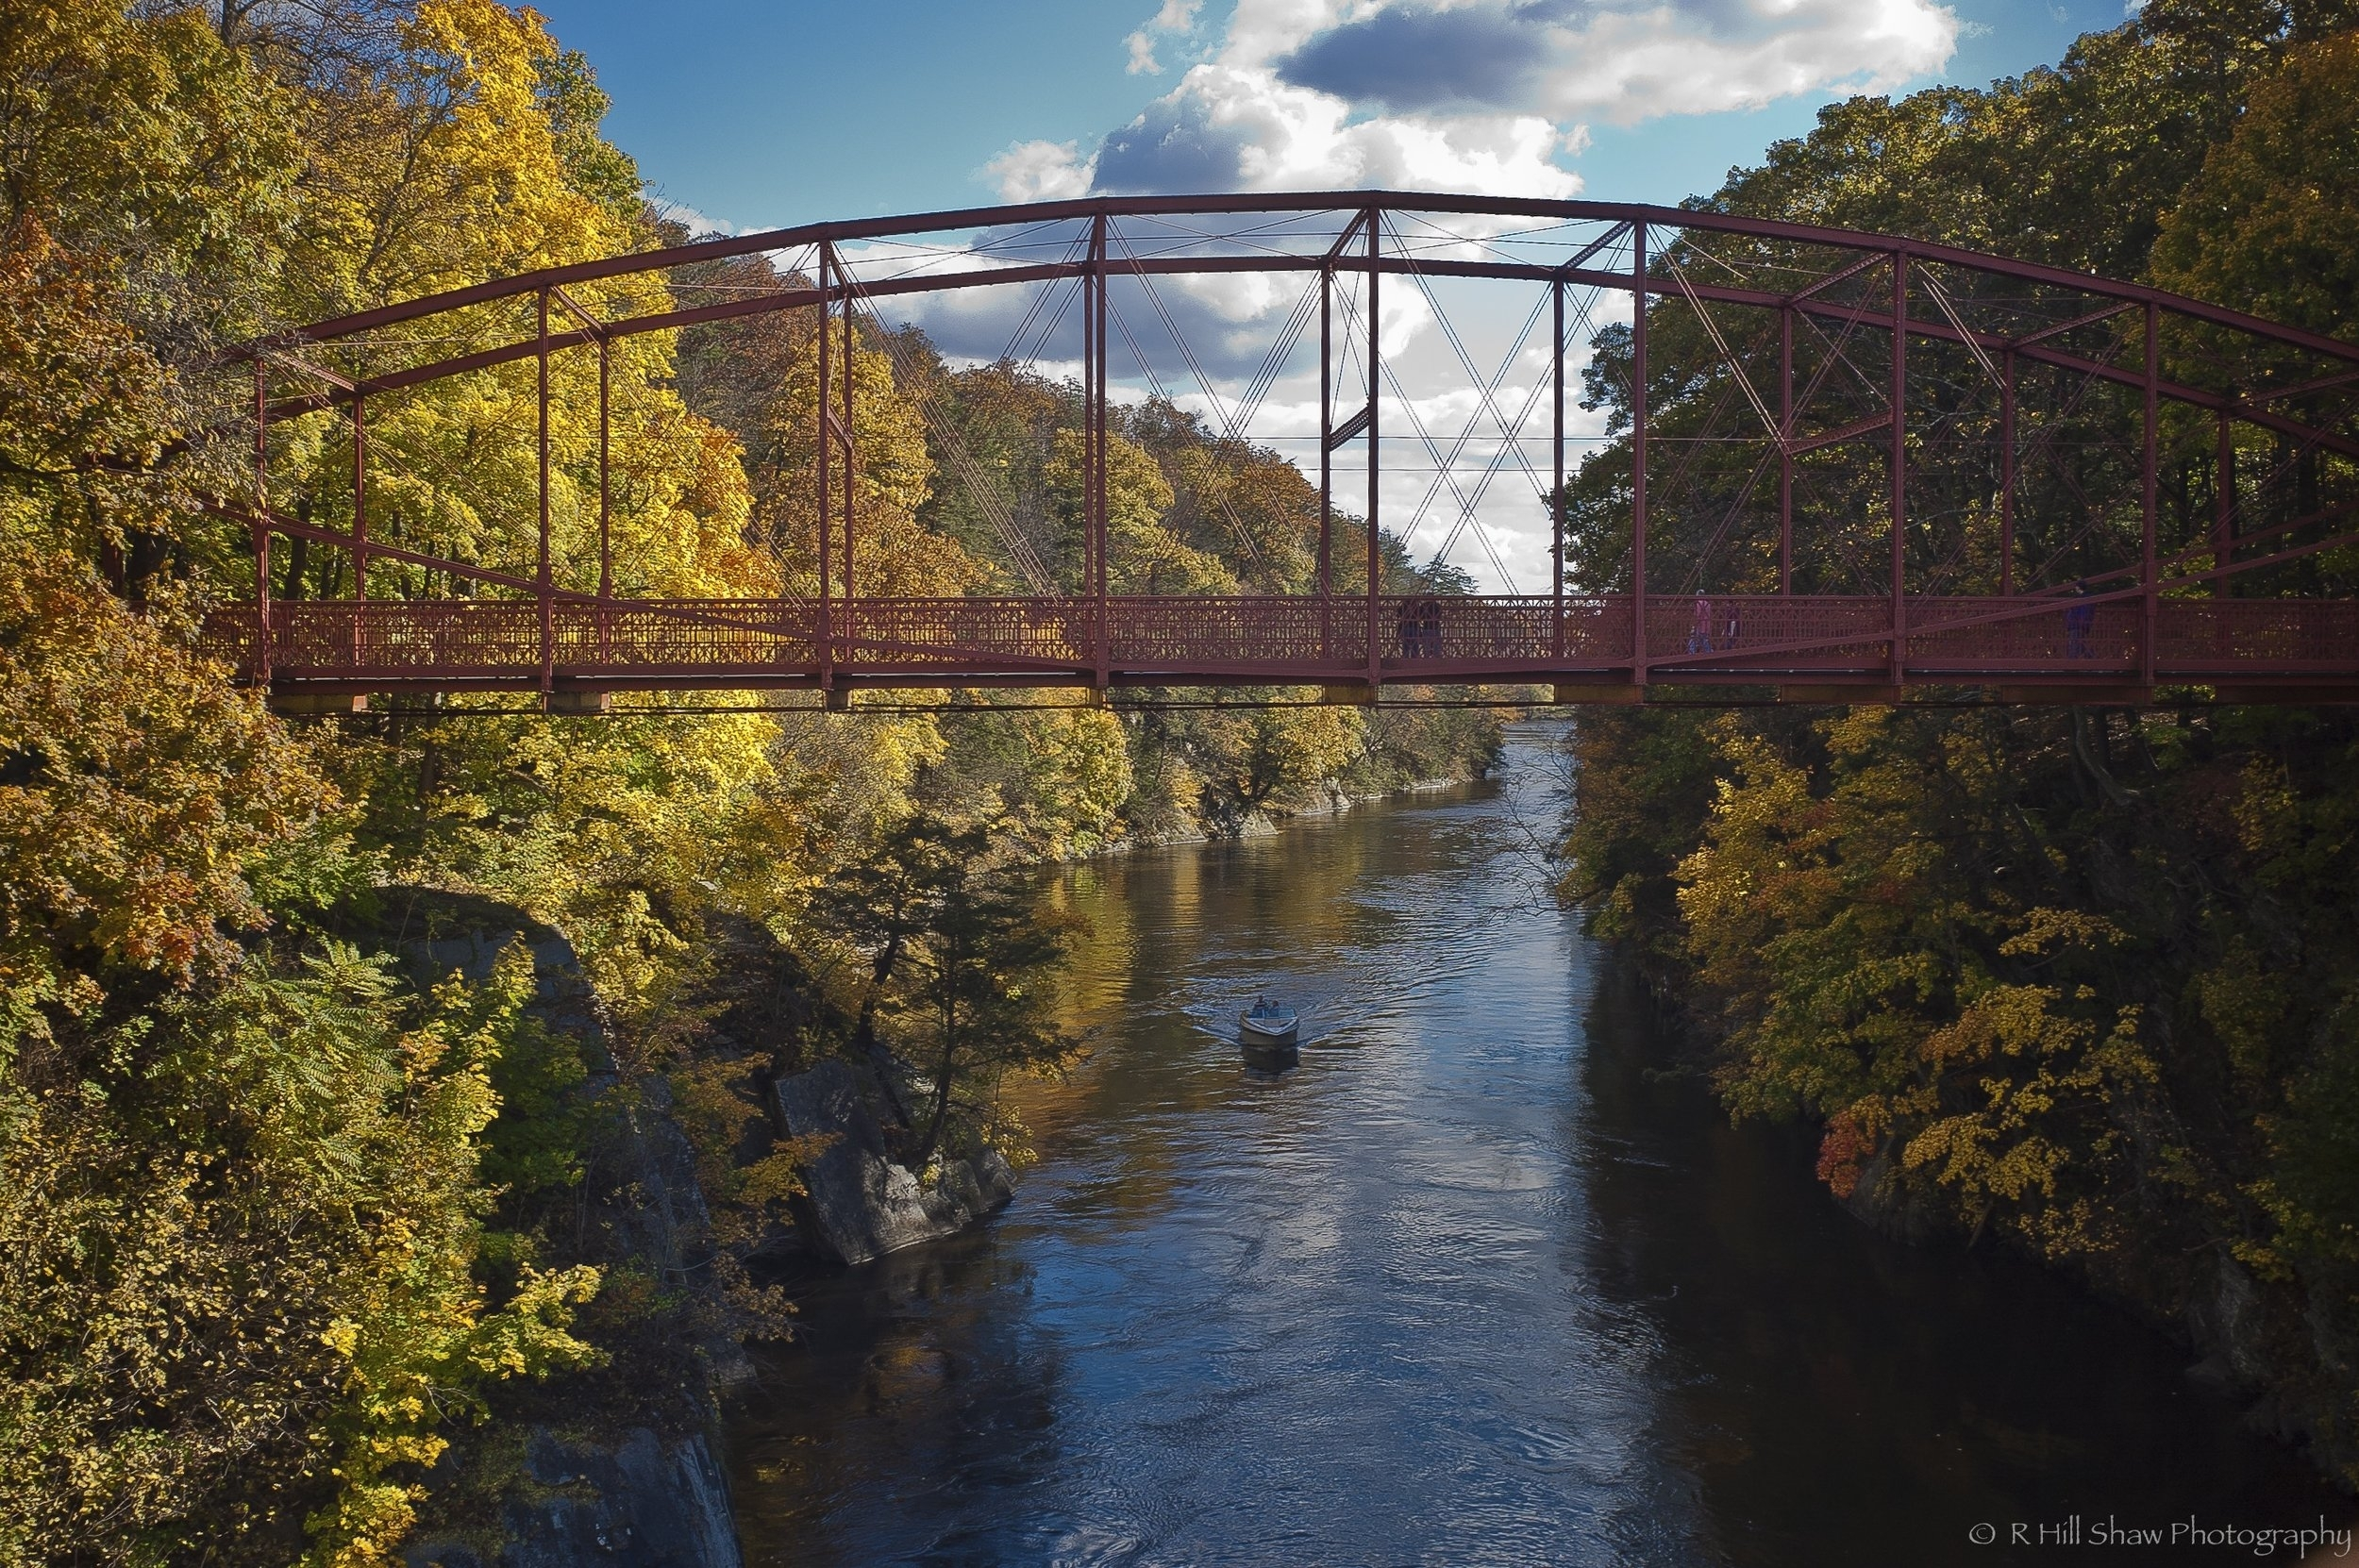 Lover_Leap_Bridge_-_New_Milford_Ct_-_Built_by_The_Berlin_Iron_Bridge_Company_1895..jpg